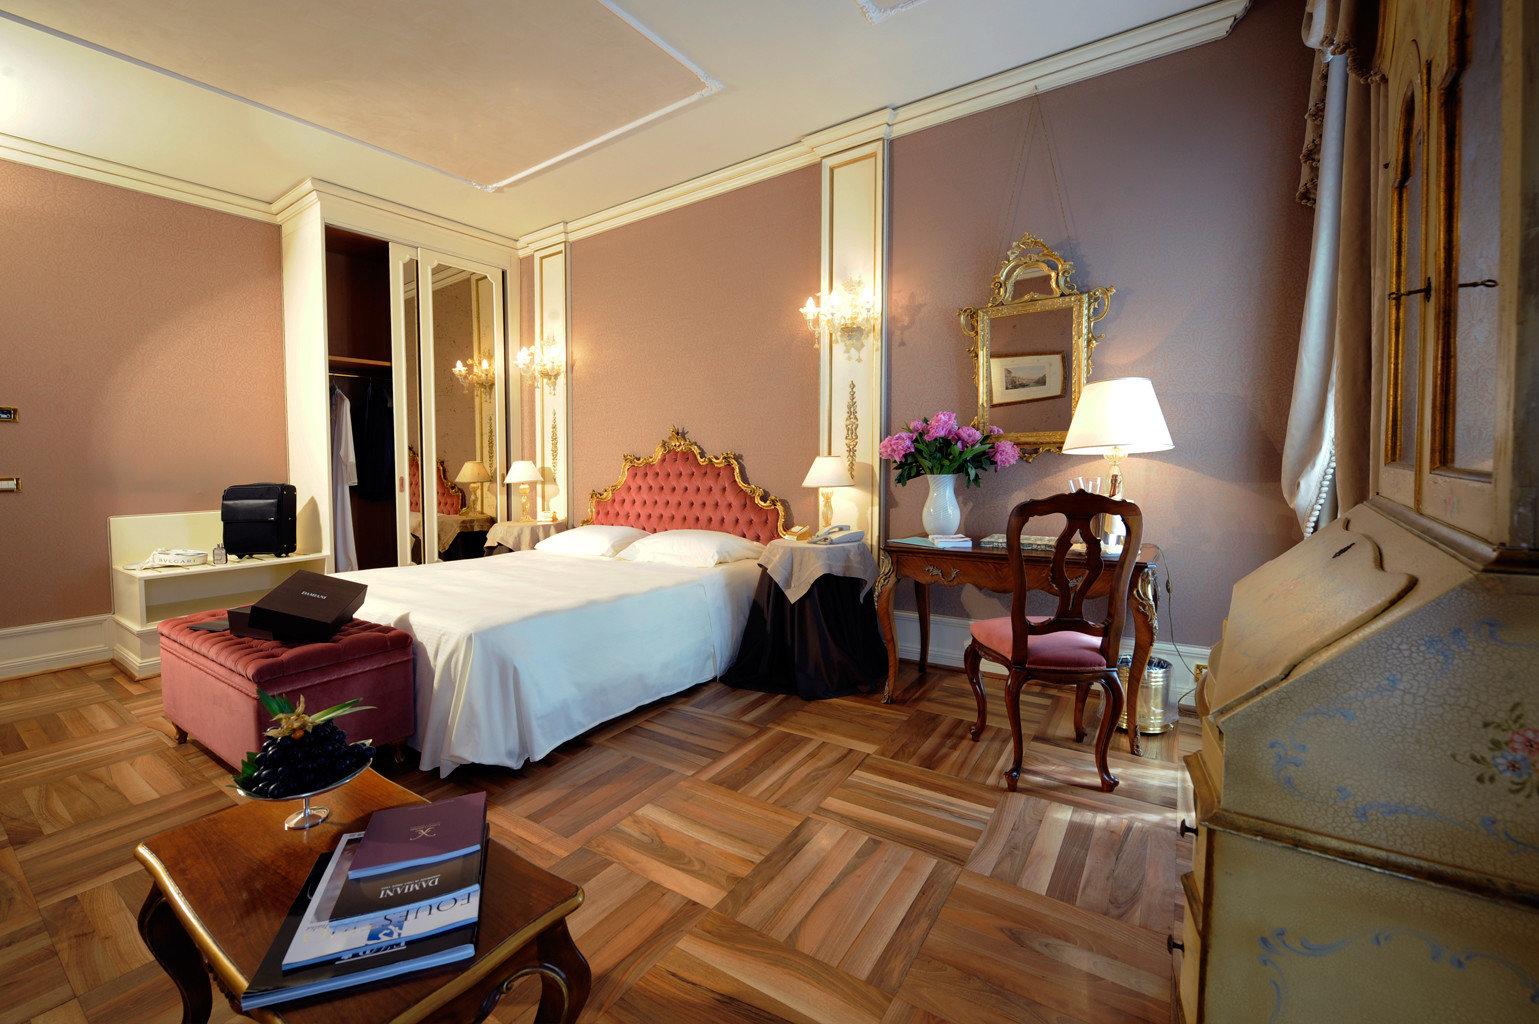 Bedroom Historic Luxury Romance Suite property living room home cottage hardwood Villa